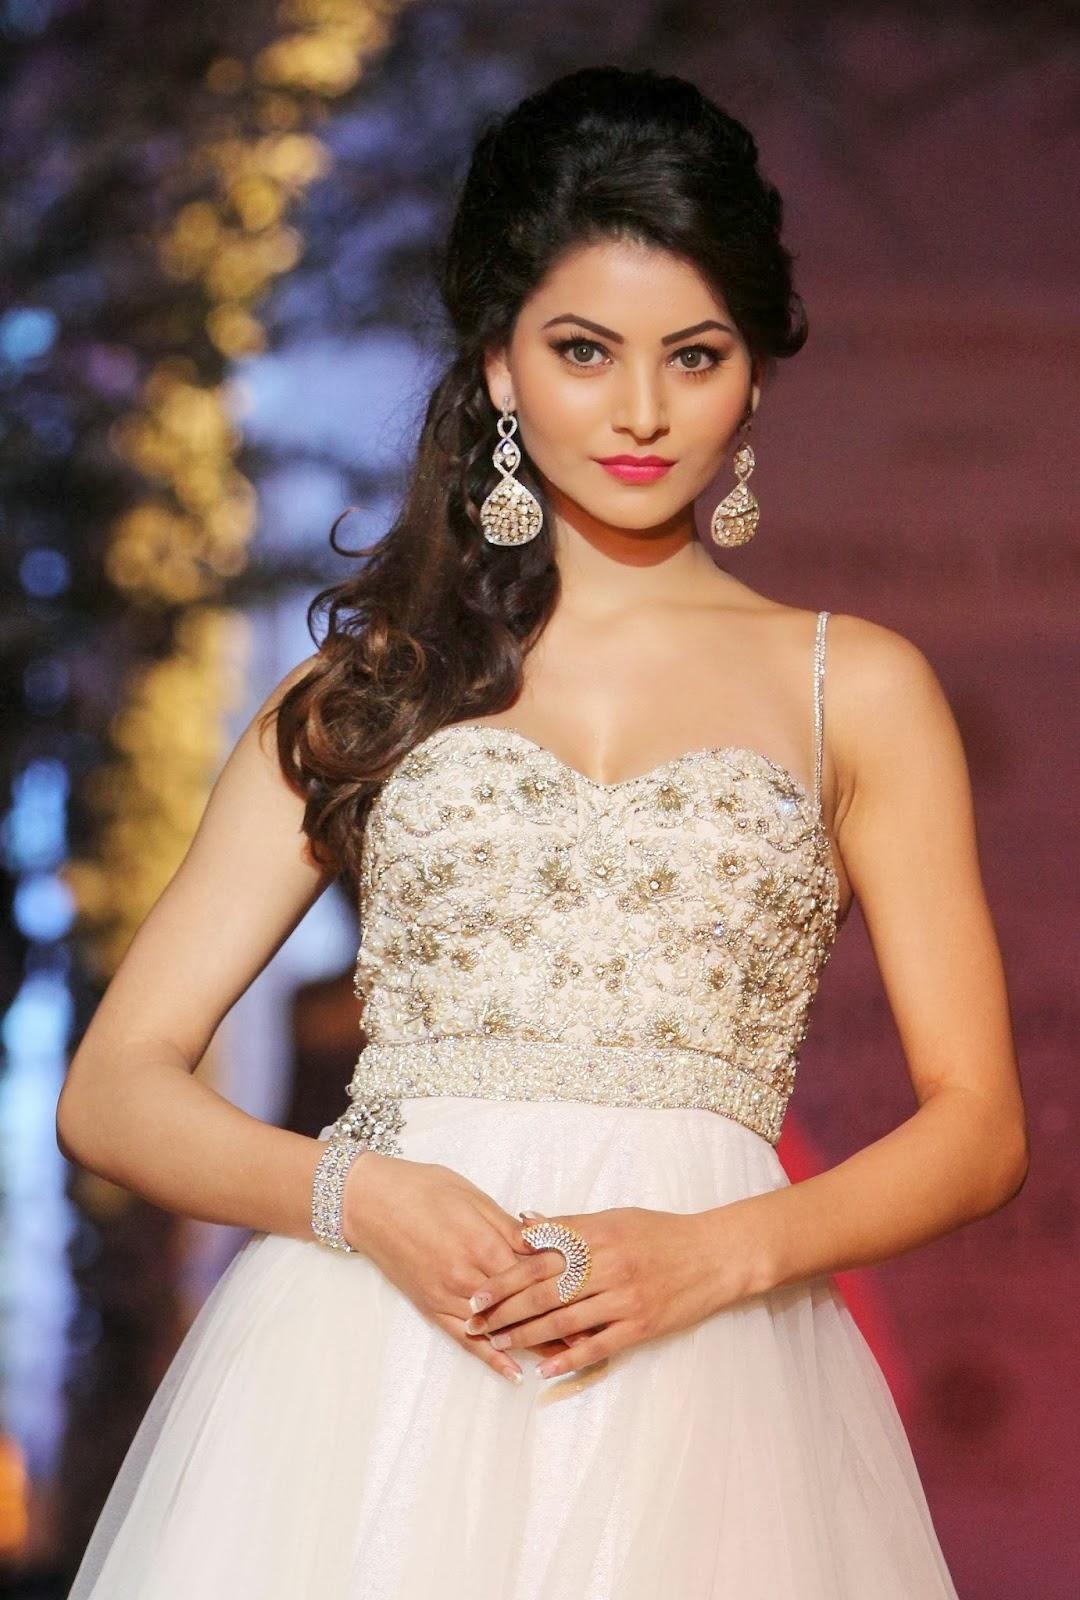 Urvashi Rautela saree cleavage backless HD Wallpapers ...